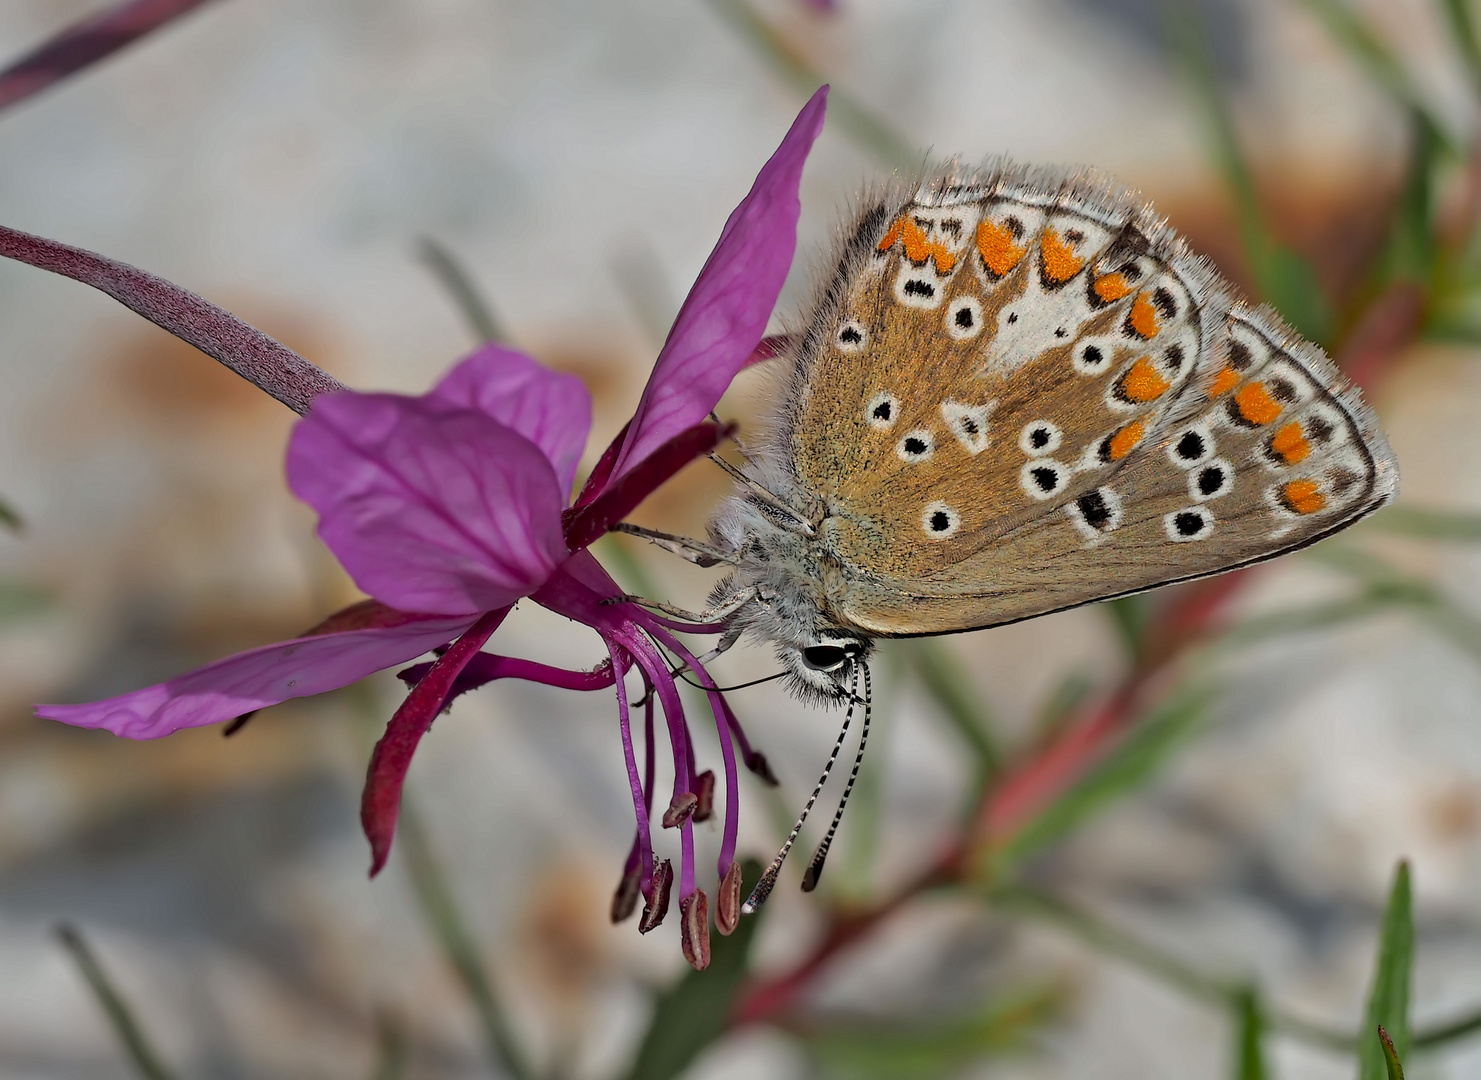 Grosser Sonnenröschen-Bläuling (Aricia artaxerxes) - L'Argus de l'hélianthème.